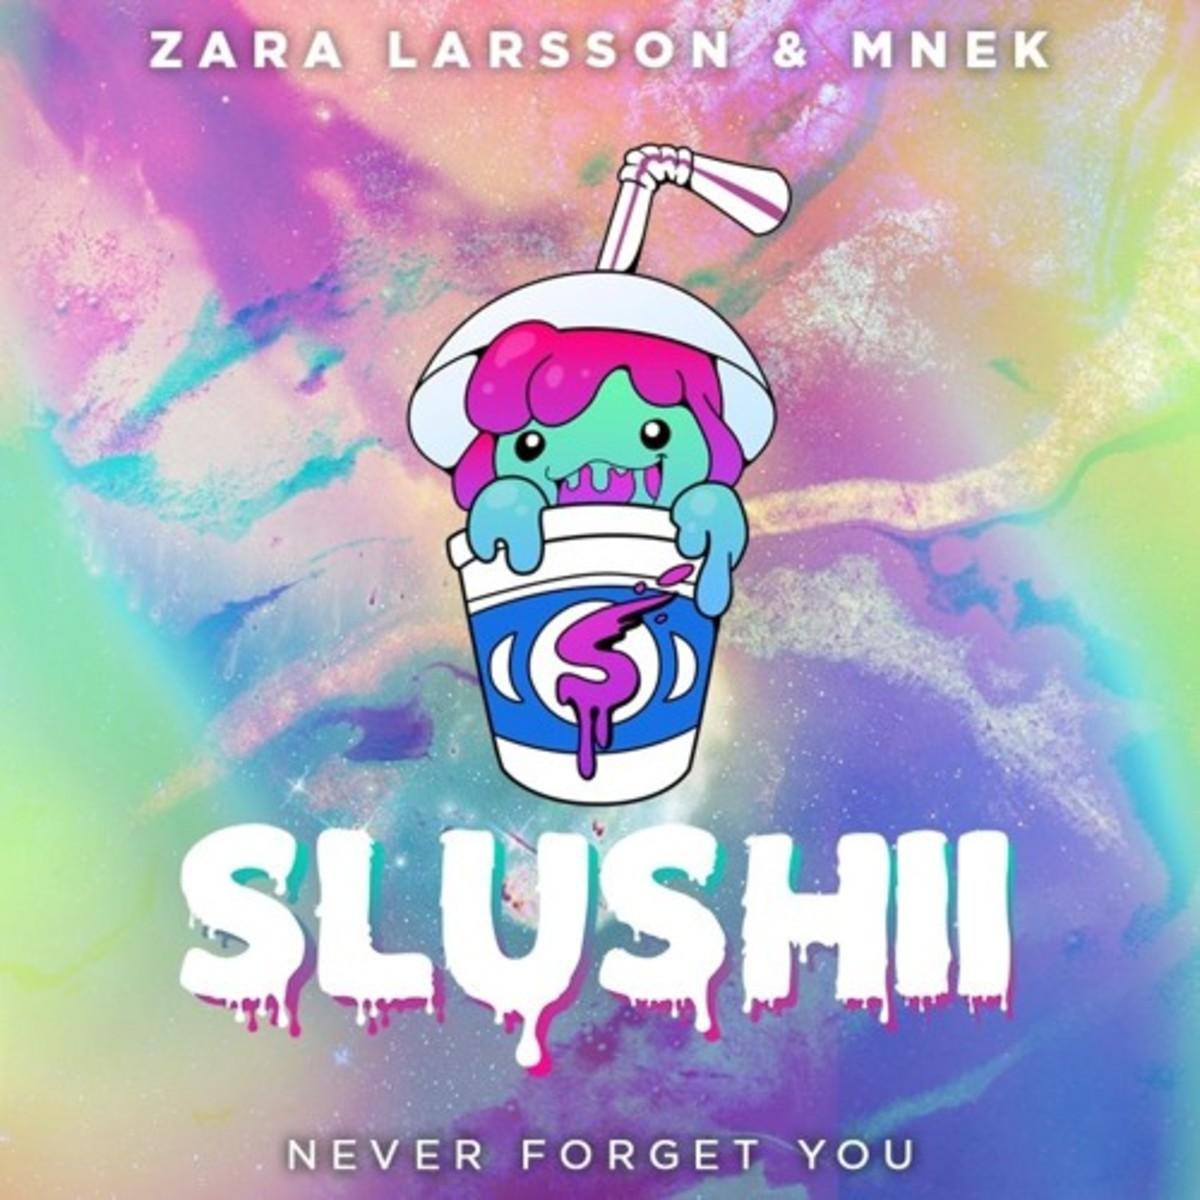 Zara Larsson & MNEK - Never Forget You Slushii Remix